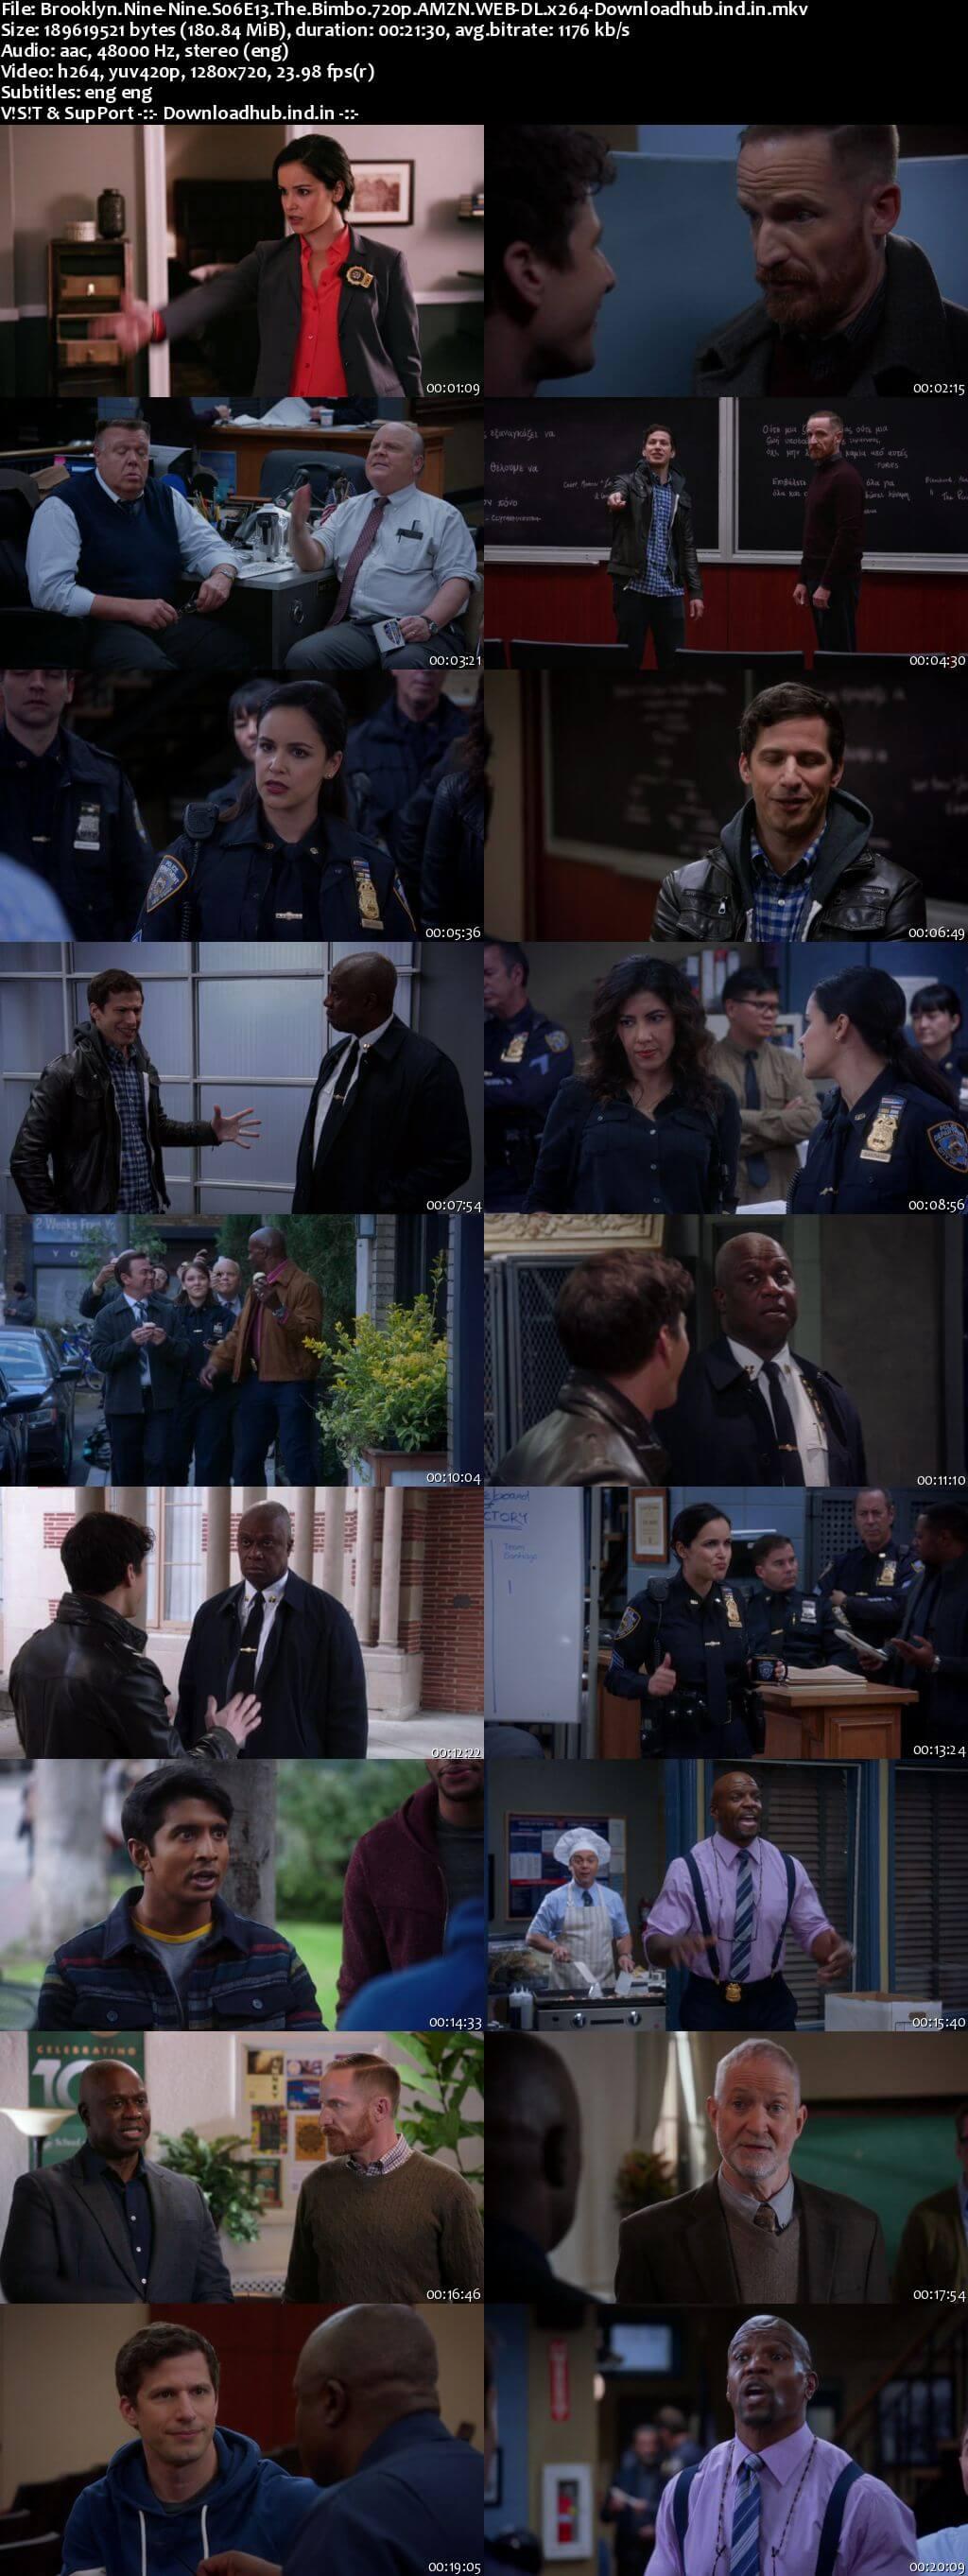 Brooklyn Nine-Nine S06E13 170MB WEB-DL 720p ESubs